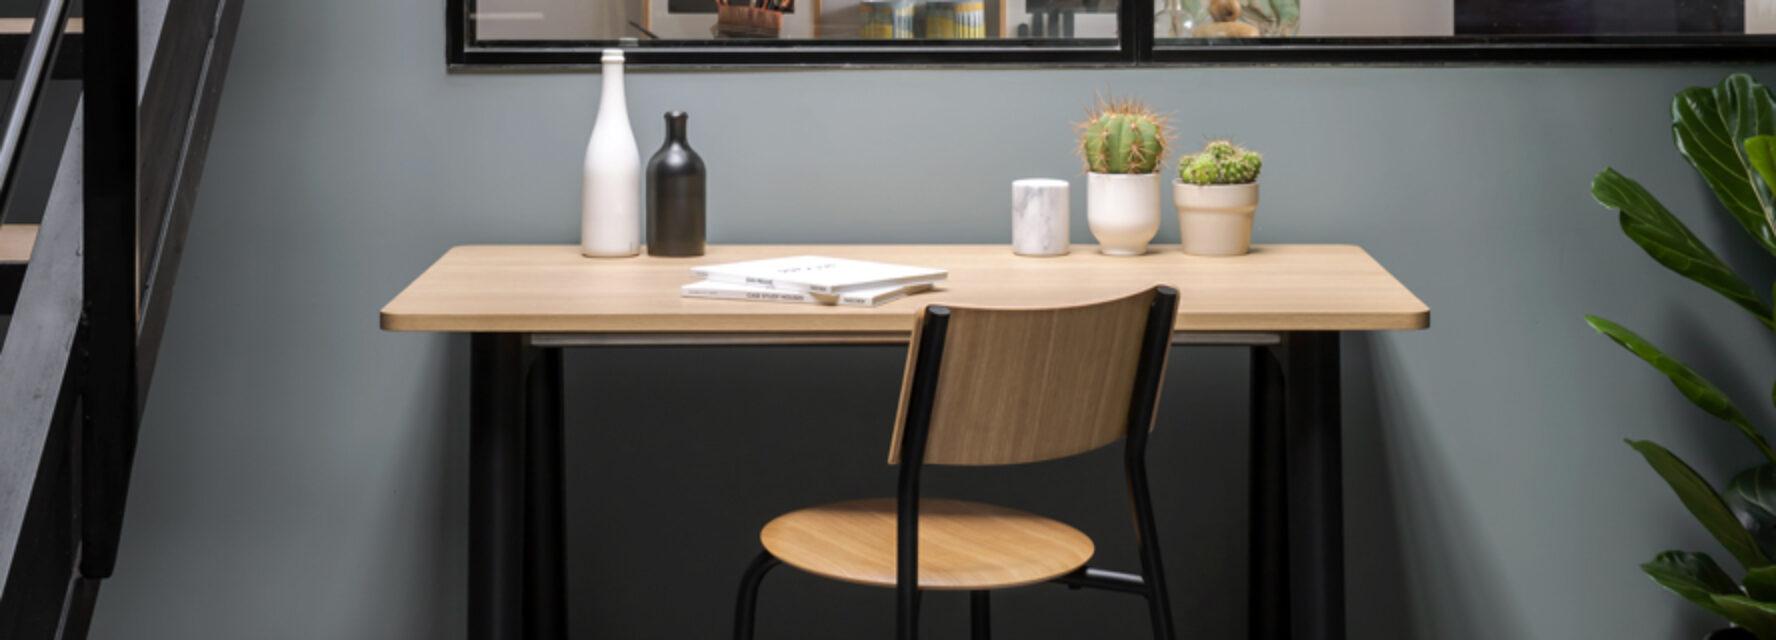 Office chairs - TIPTOE